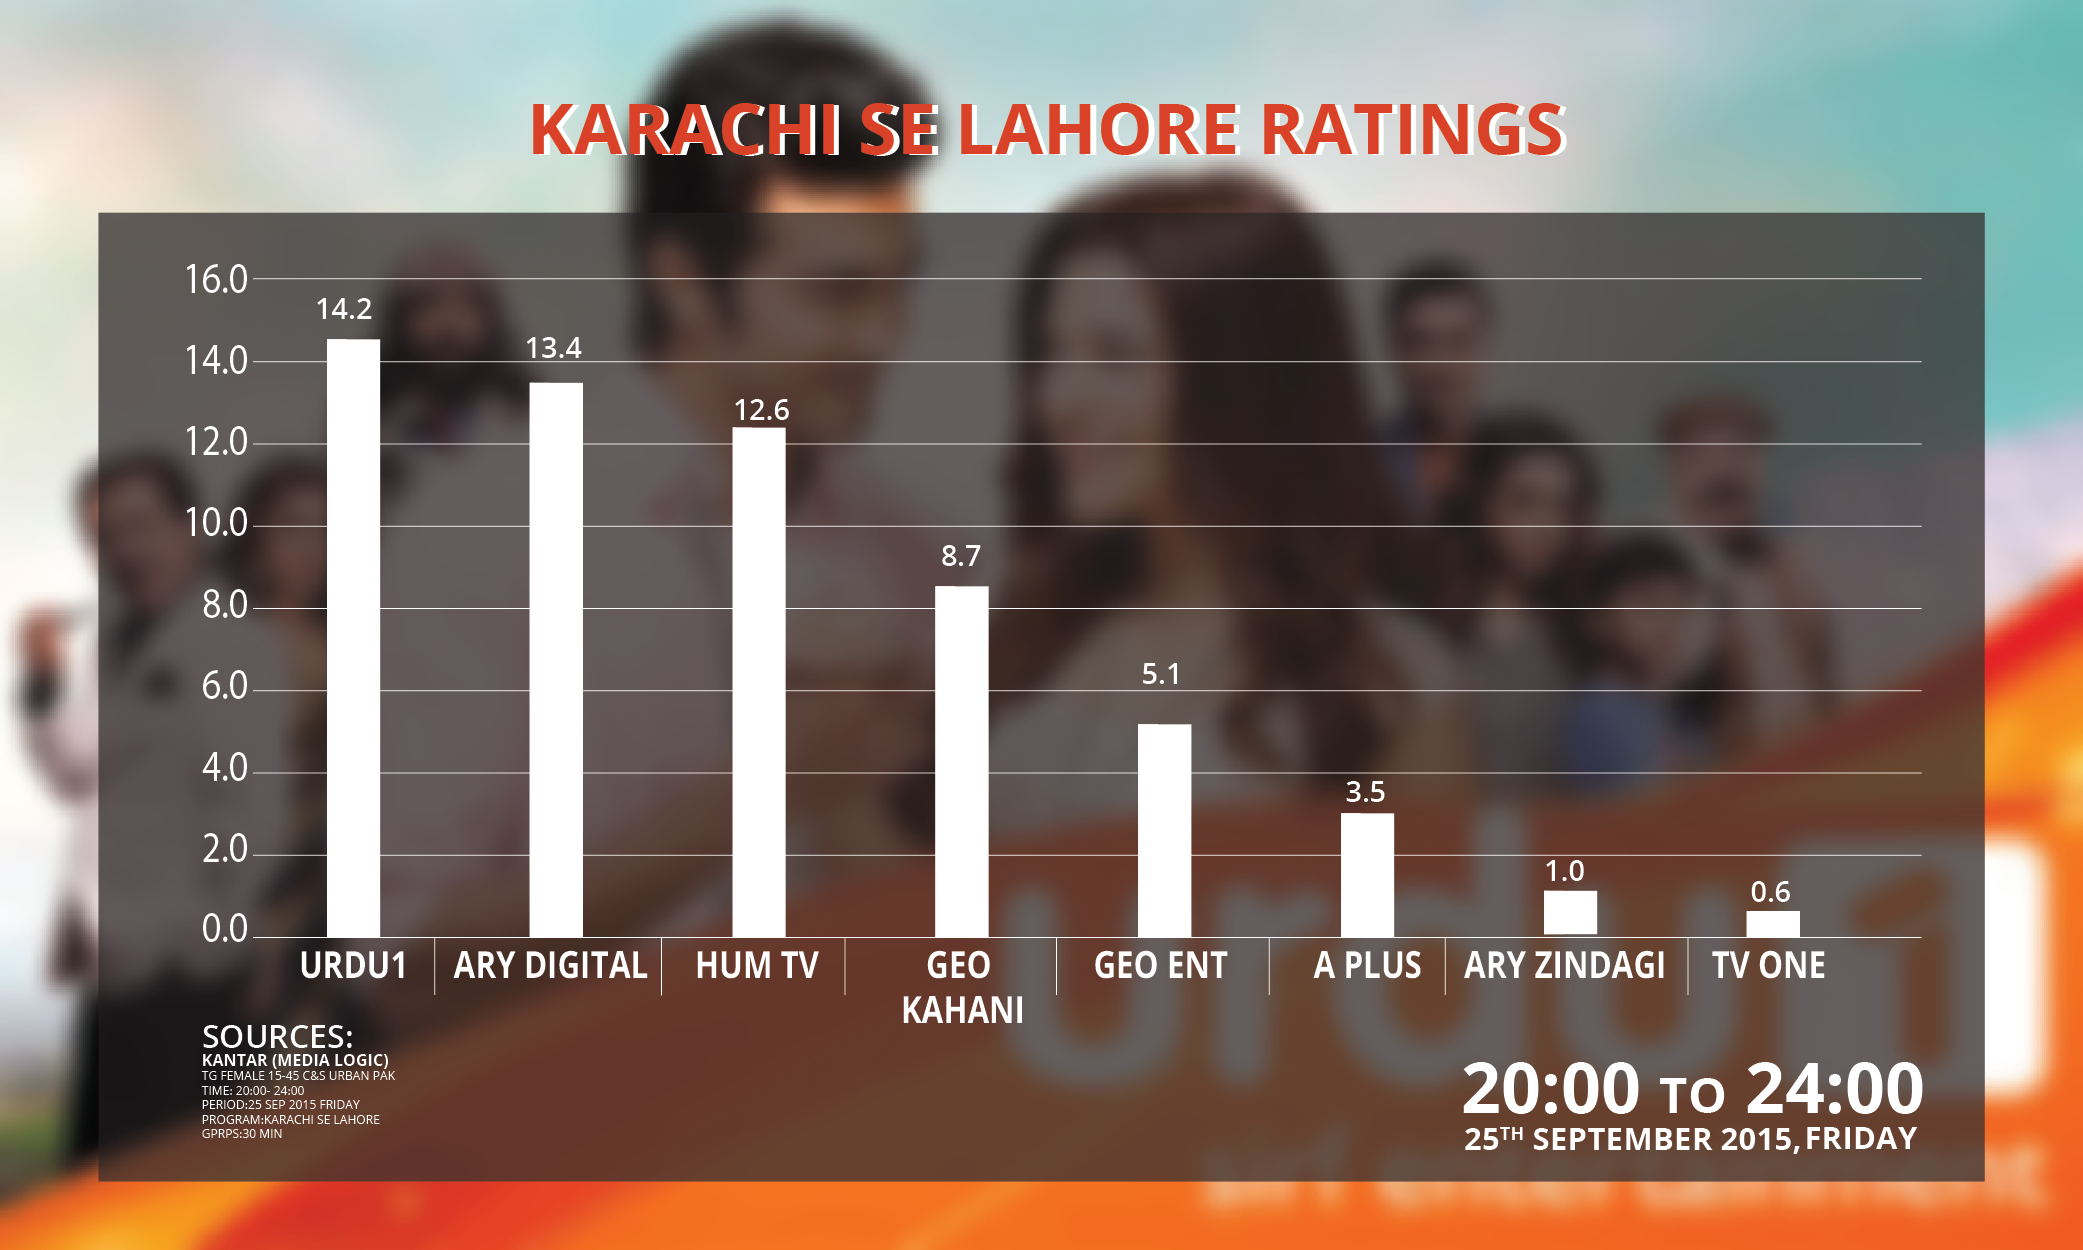 karachi se lahore ratings-01-01